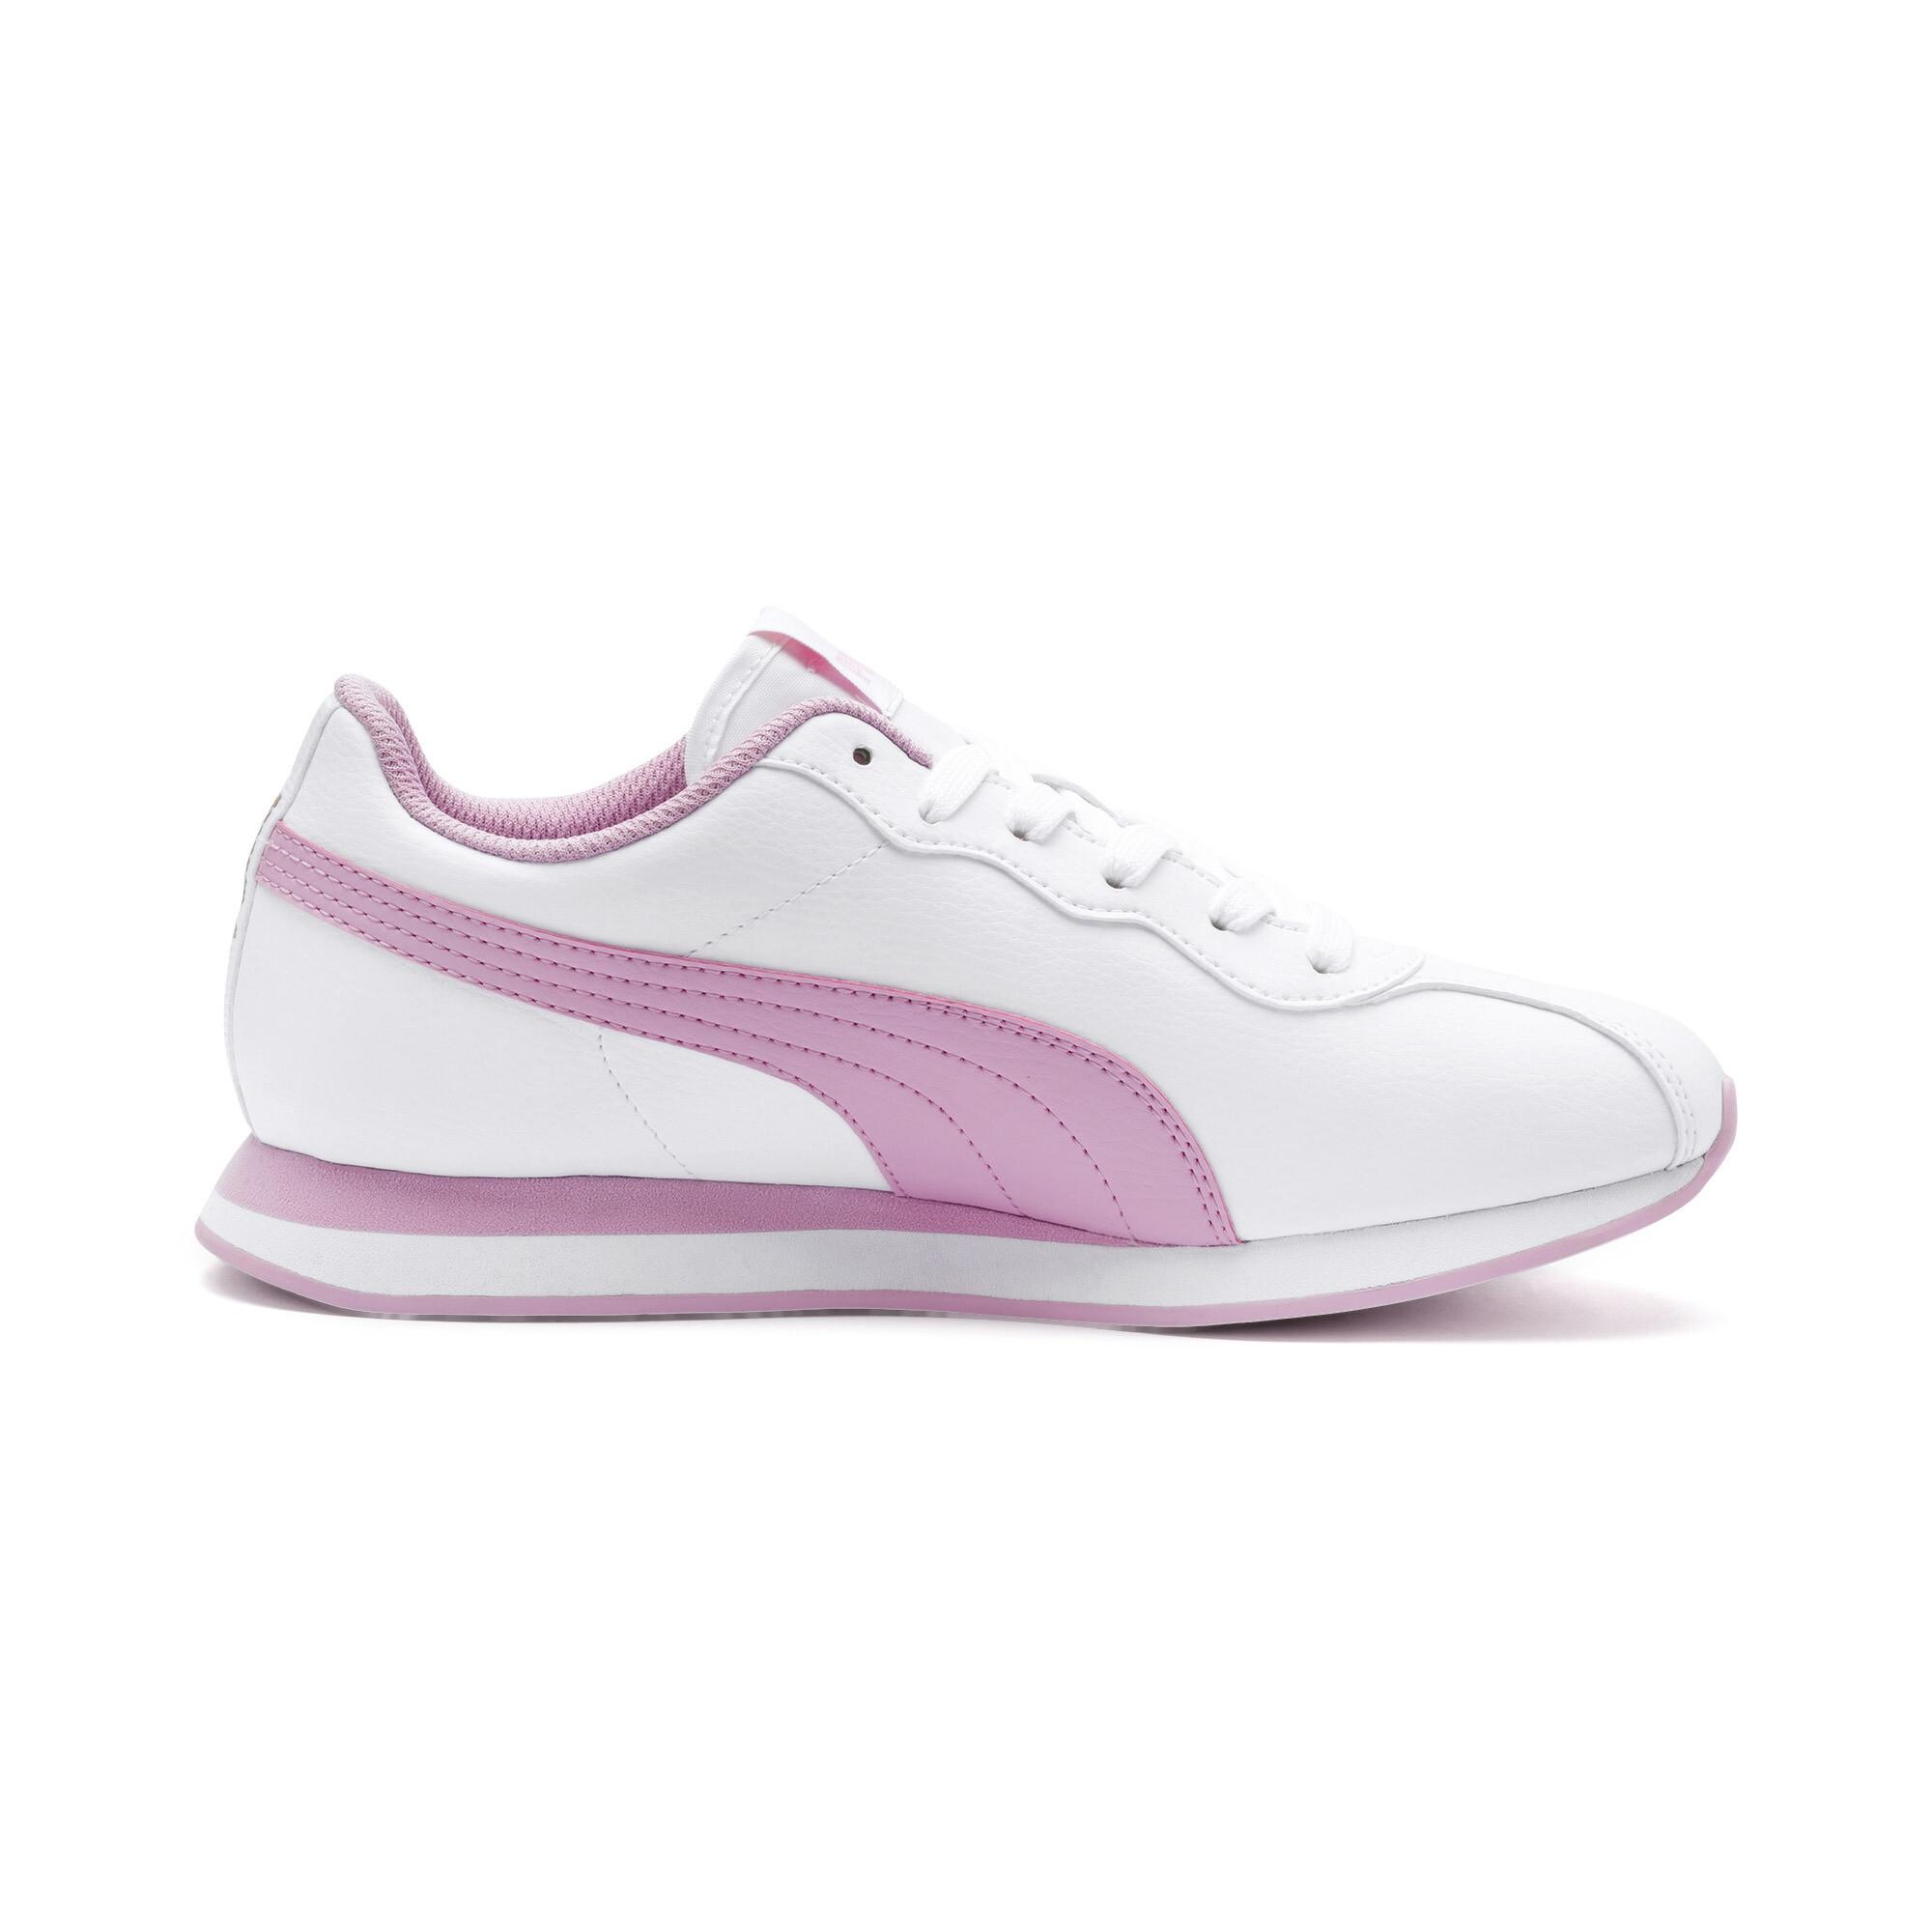 PUMA-Men-039-s-Turin-II-Sneakers thumbnail 28